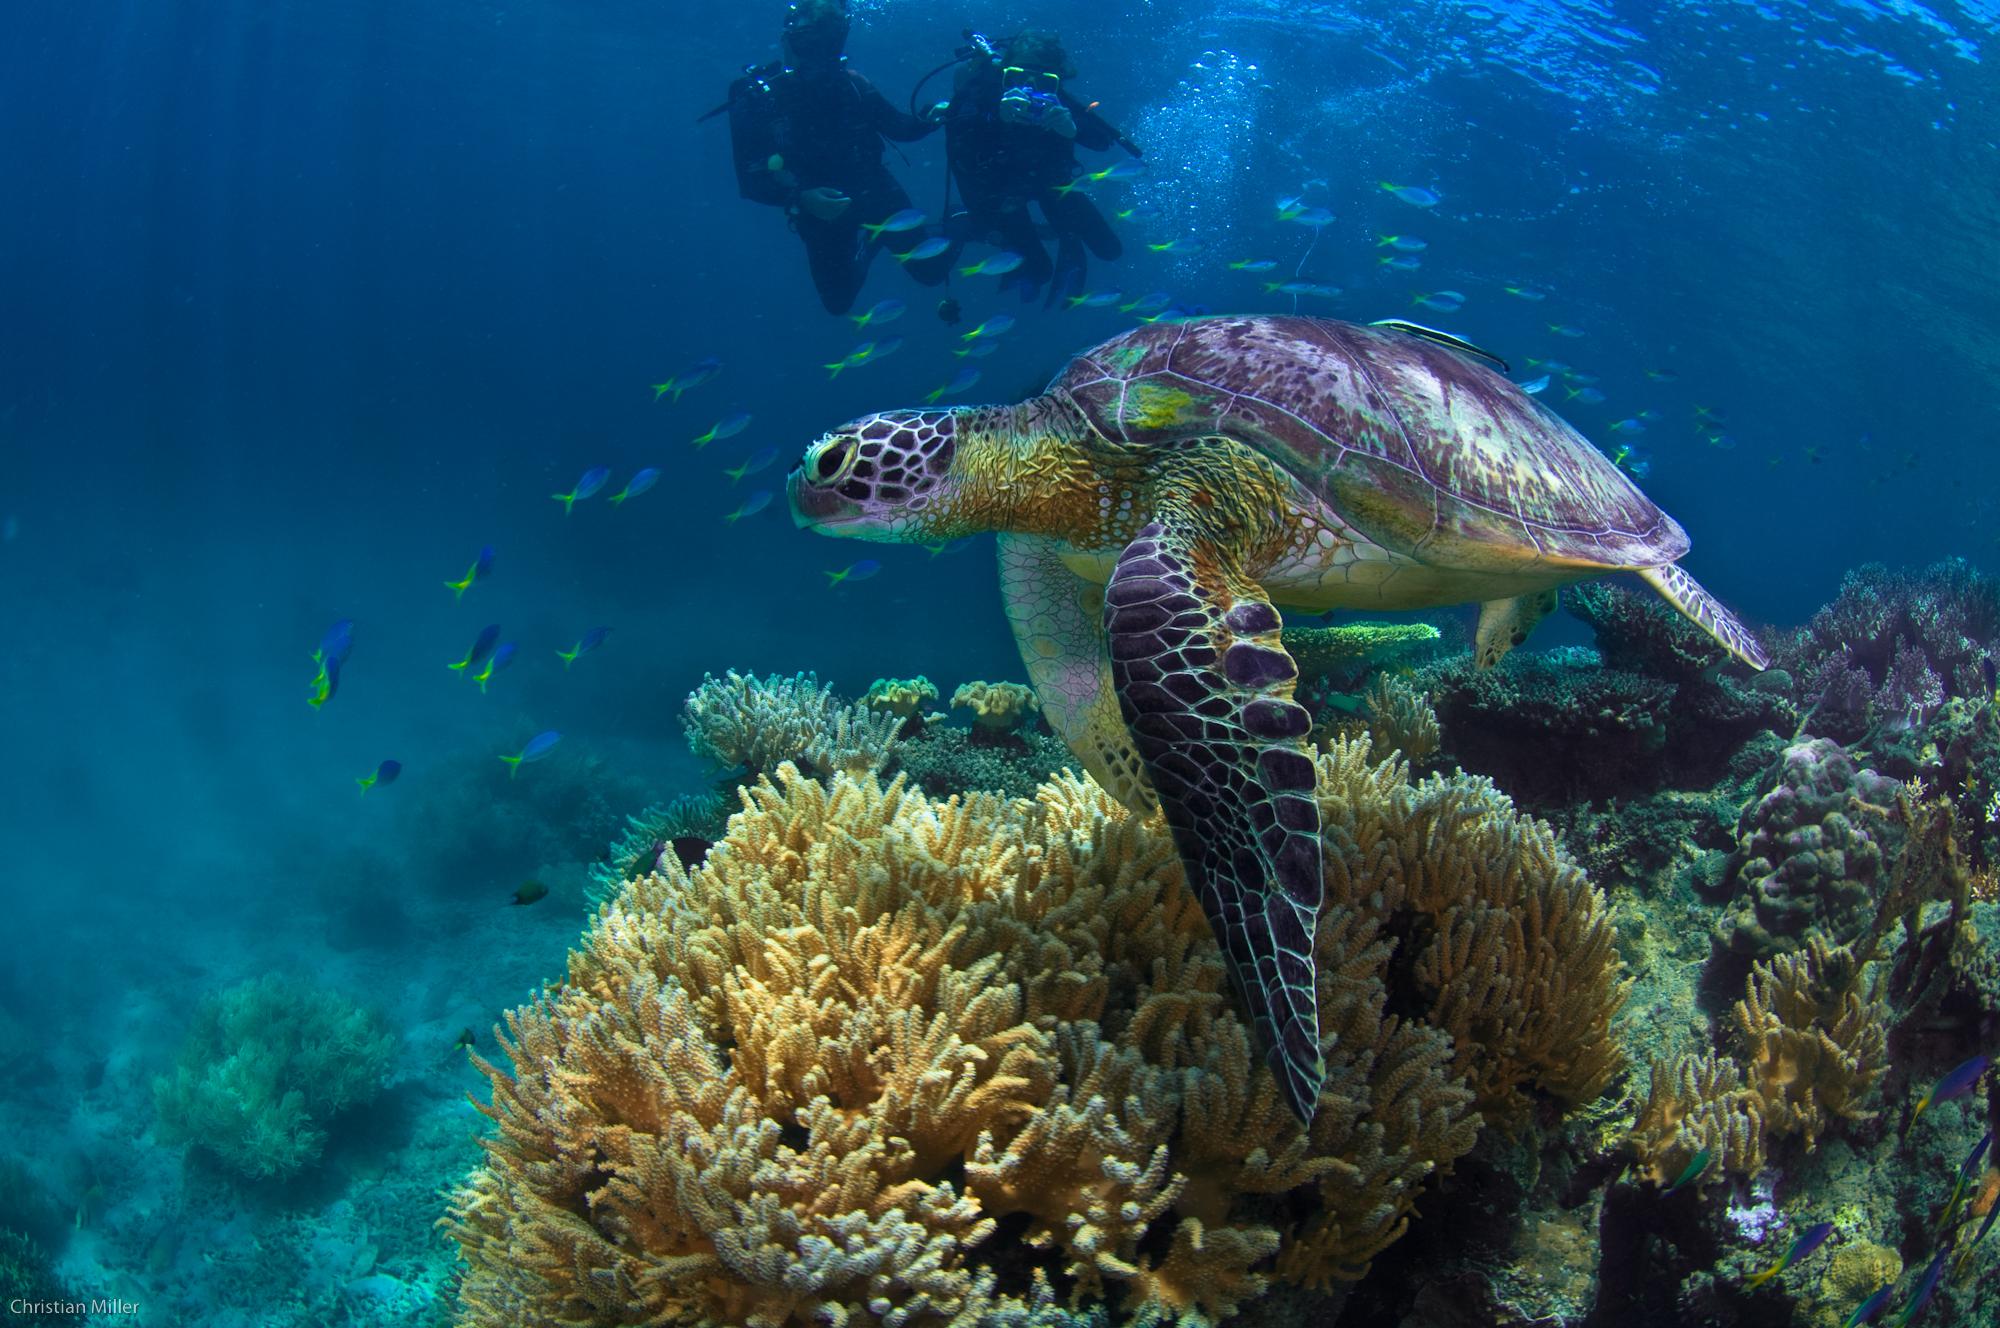 fitzroy-island-resort-great-barrier-reef-australia-hotel-accommodation (8).jpg